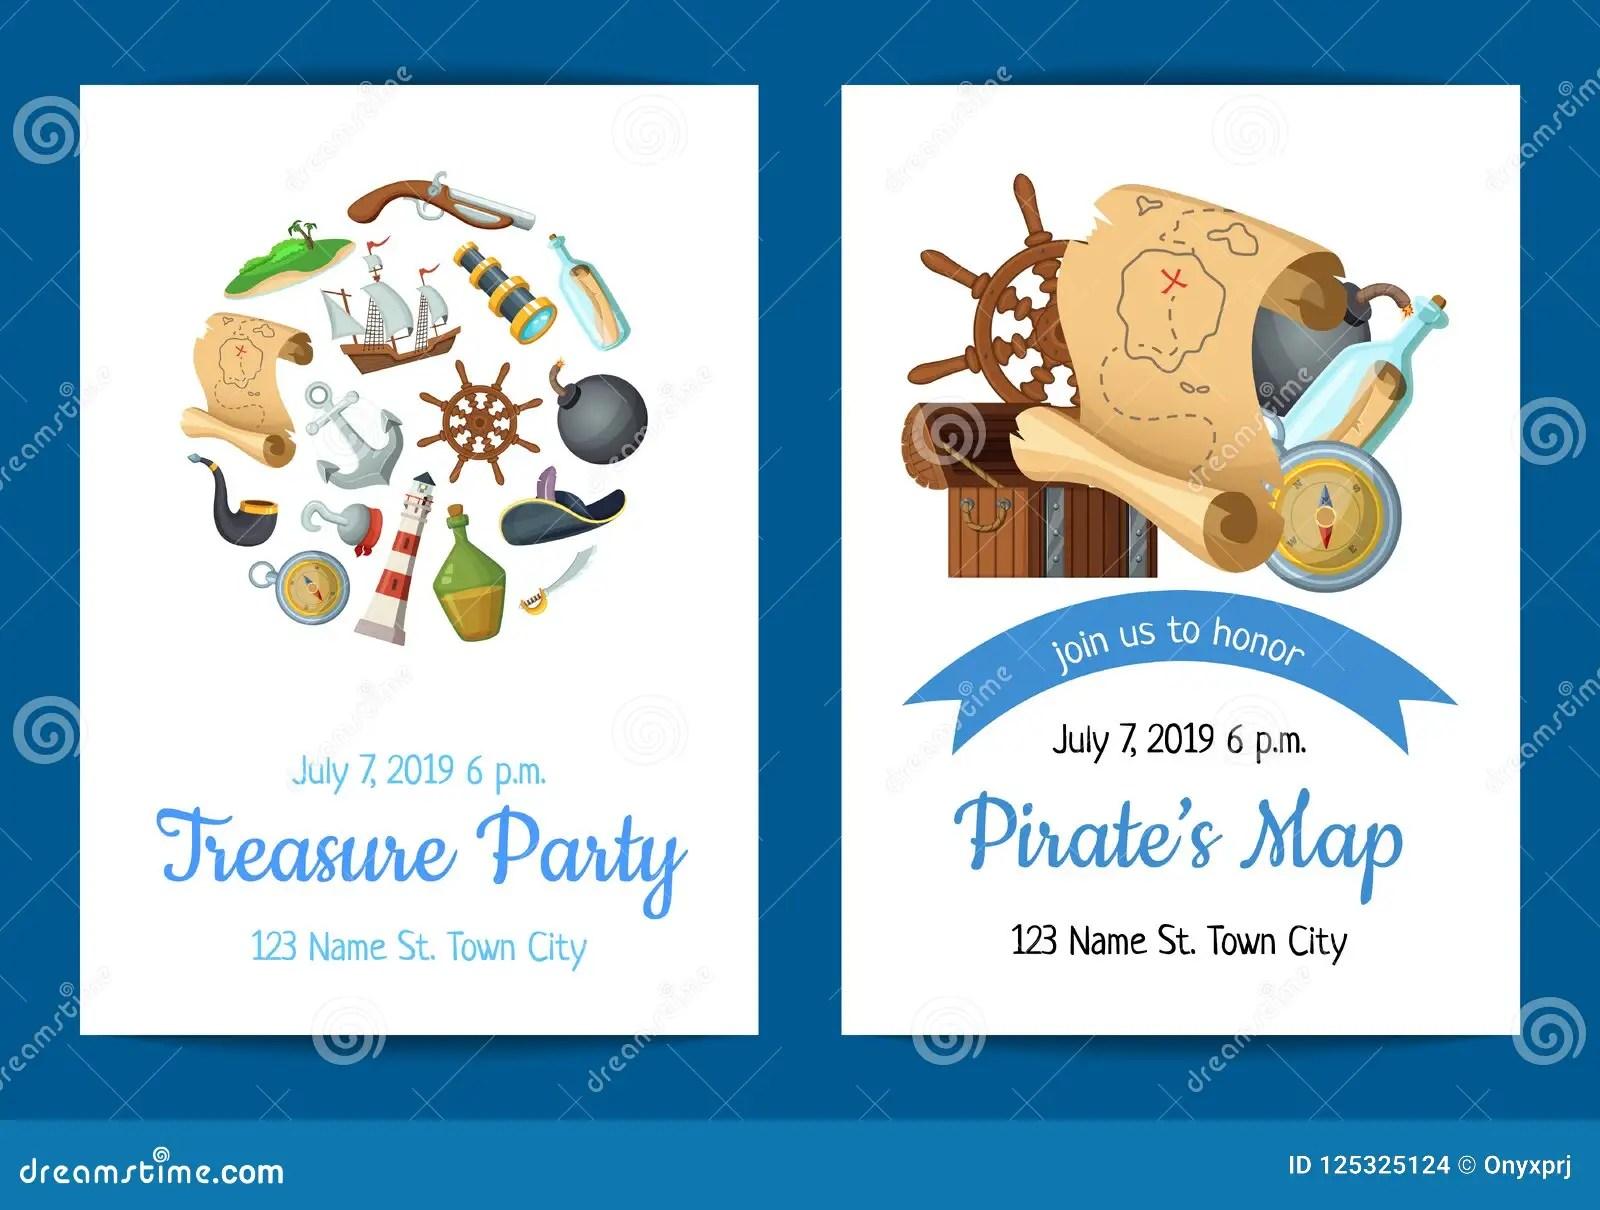 https www dreamstime com vector cartoon sea pirates birthday party invitation template illustration pirate party invitation poster adventure ocean image125325124